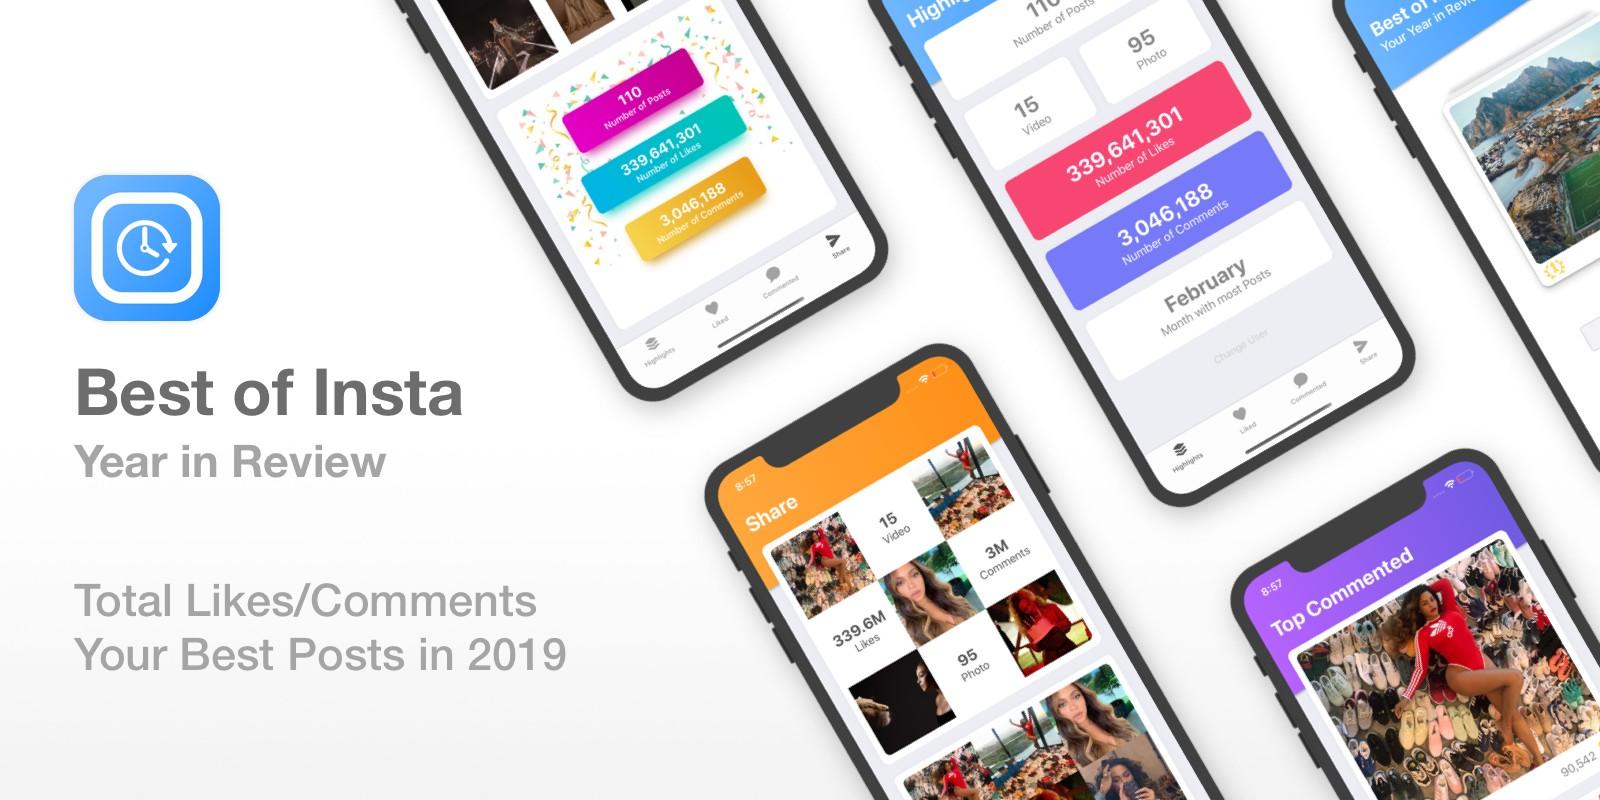 Best of Insta - Instagram Year In Review iOS